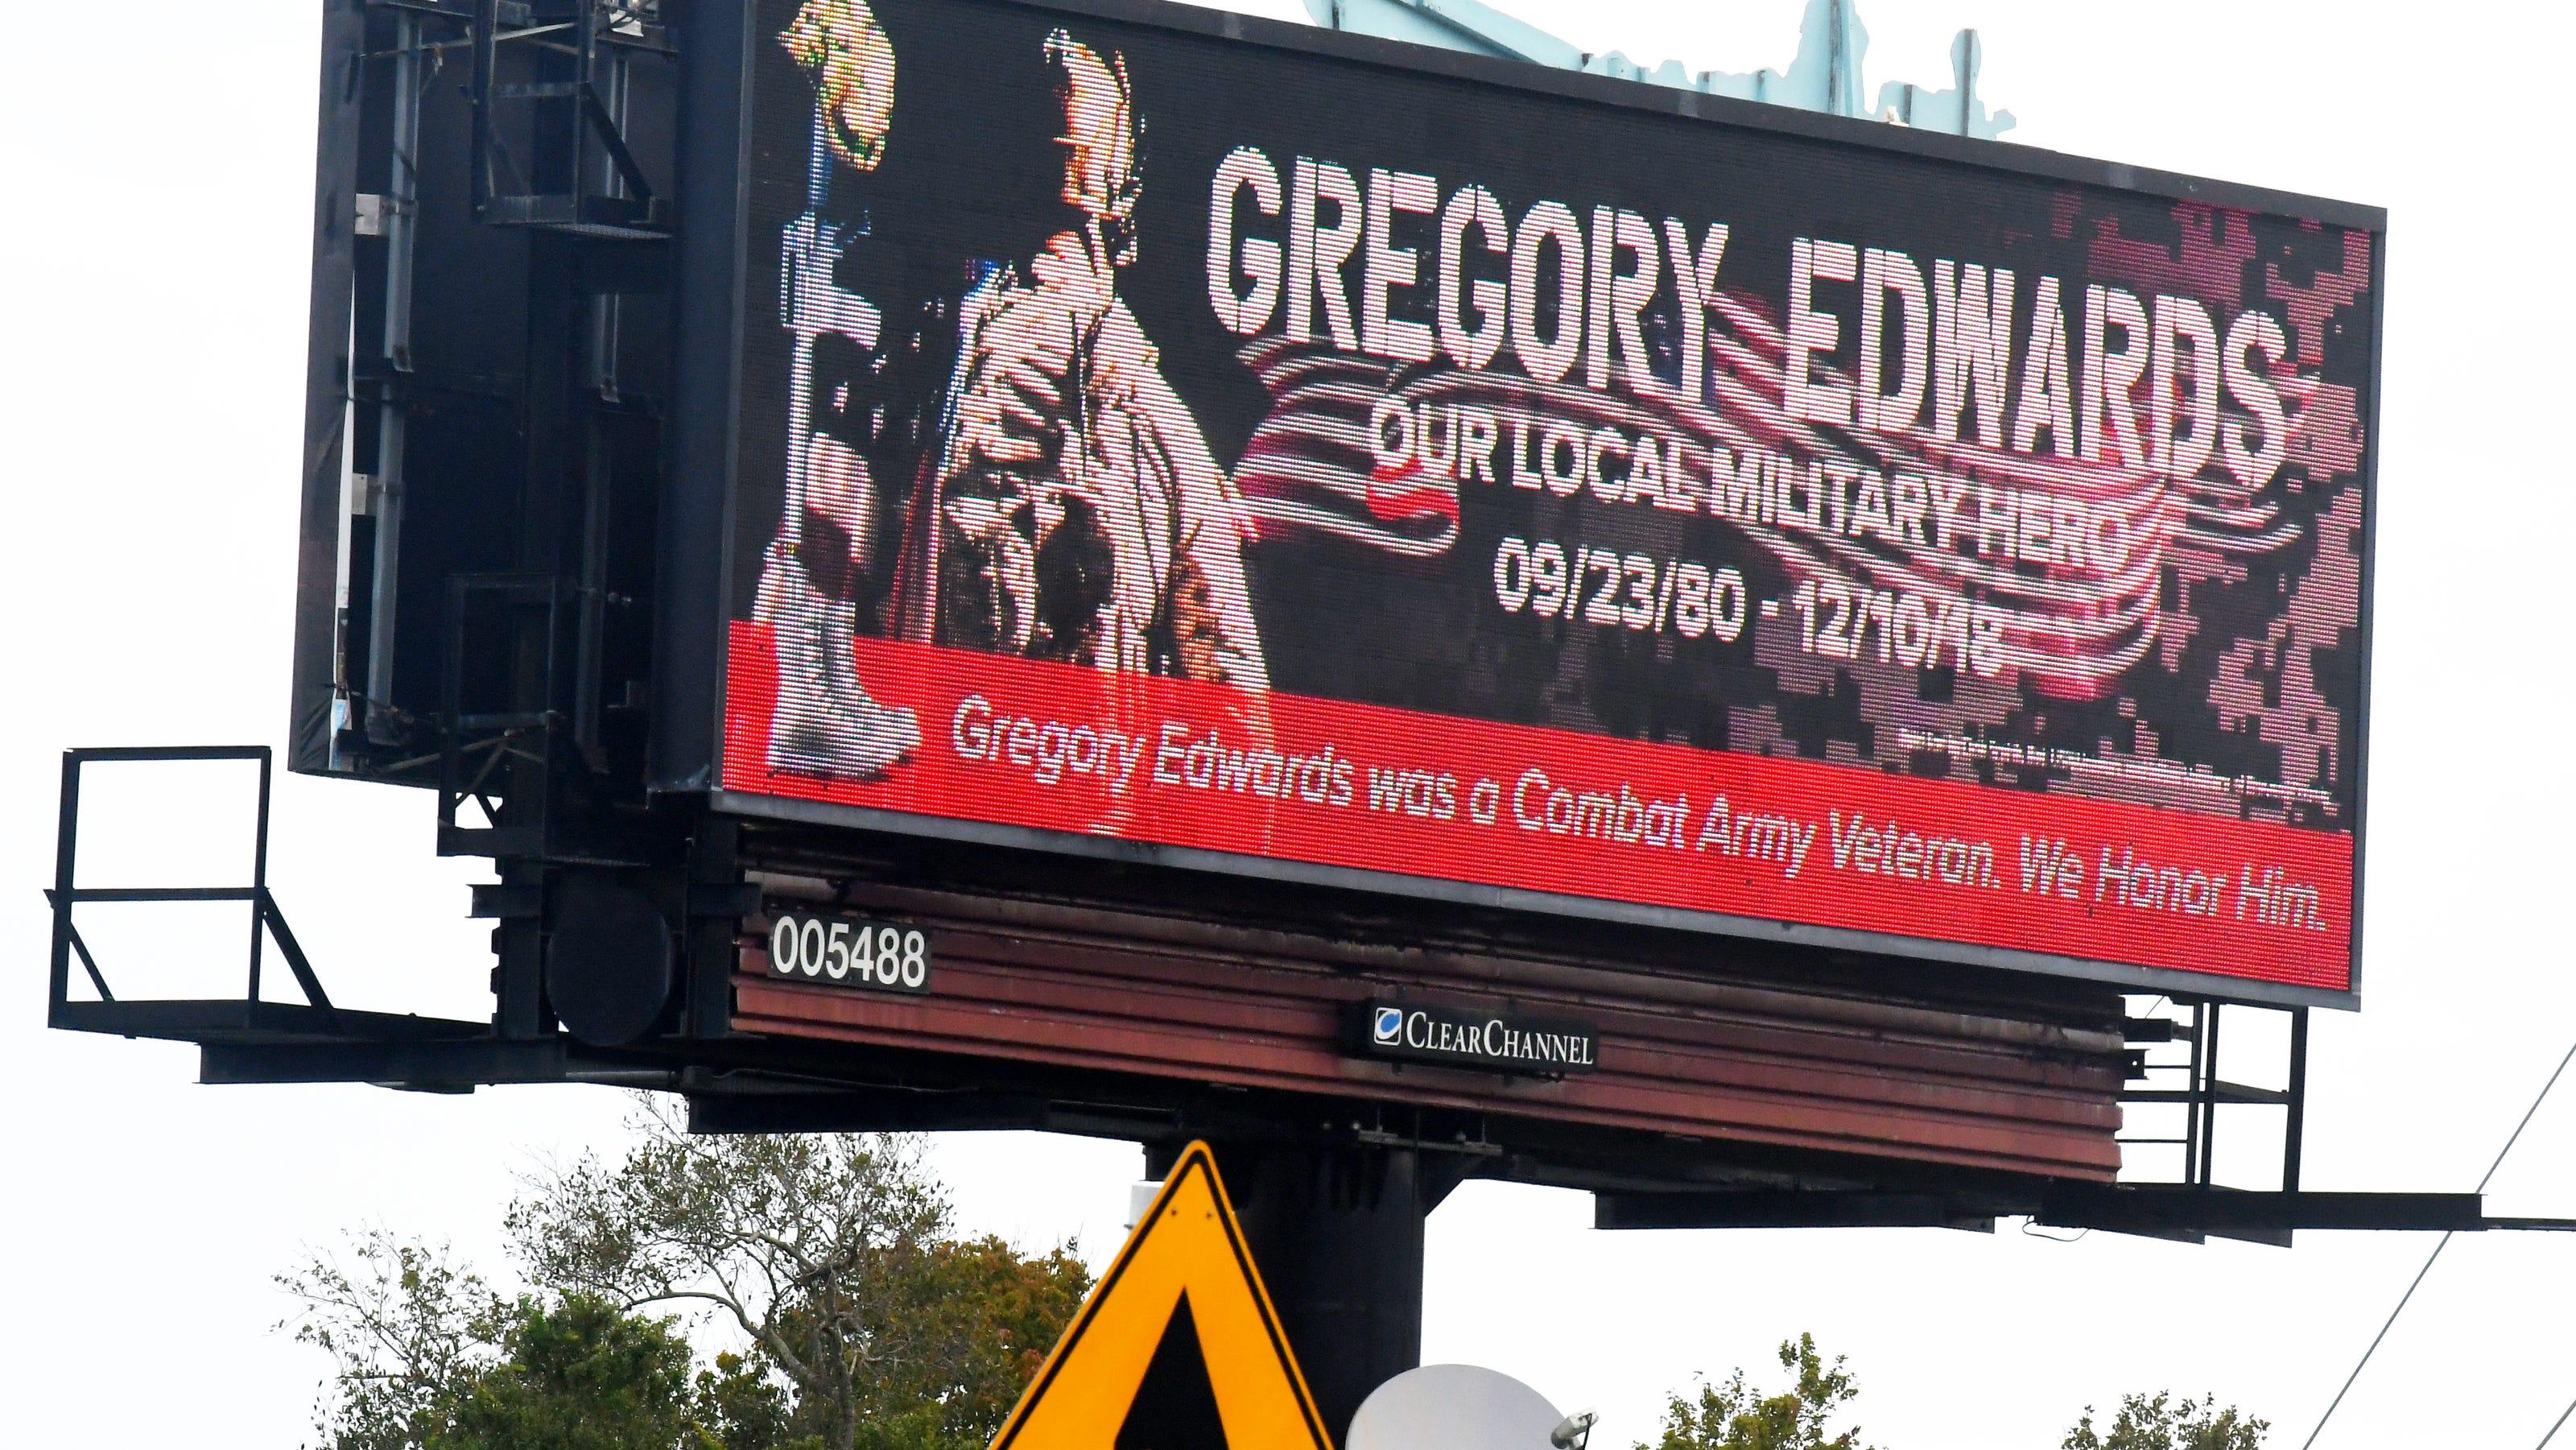 9b4028d2 e2d8 4614 bf42 5508ce2a4d6d Gregory Edwards Billboard on Interstate 95 jpg?crop=4446,2501,x0,y447&width=3200&height=1801&format=pjpg&auto=webp.